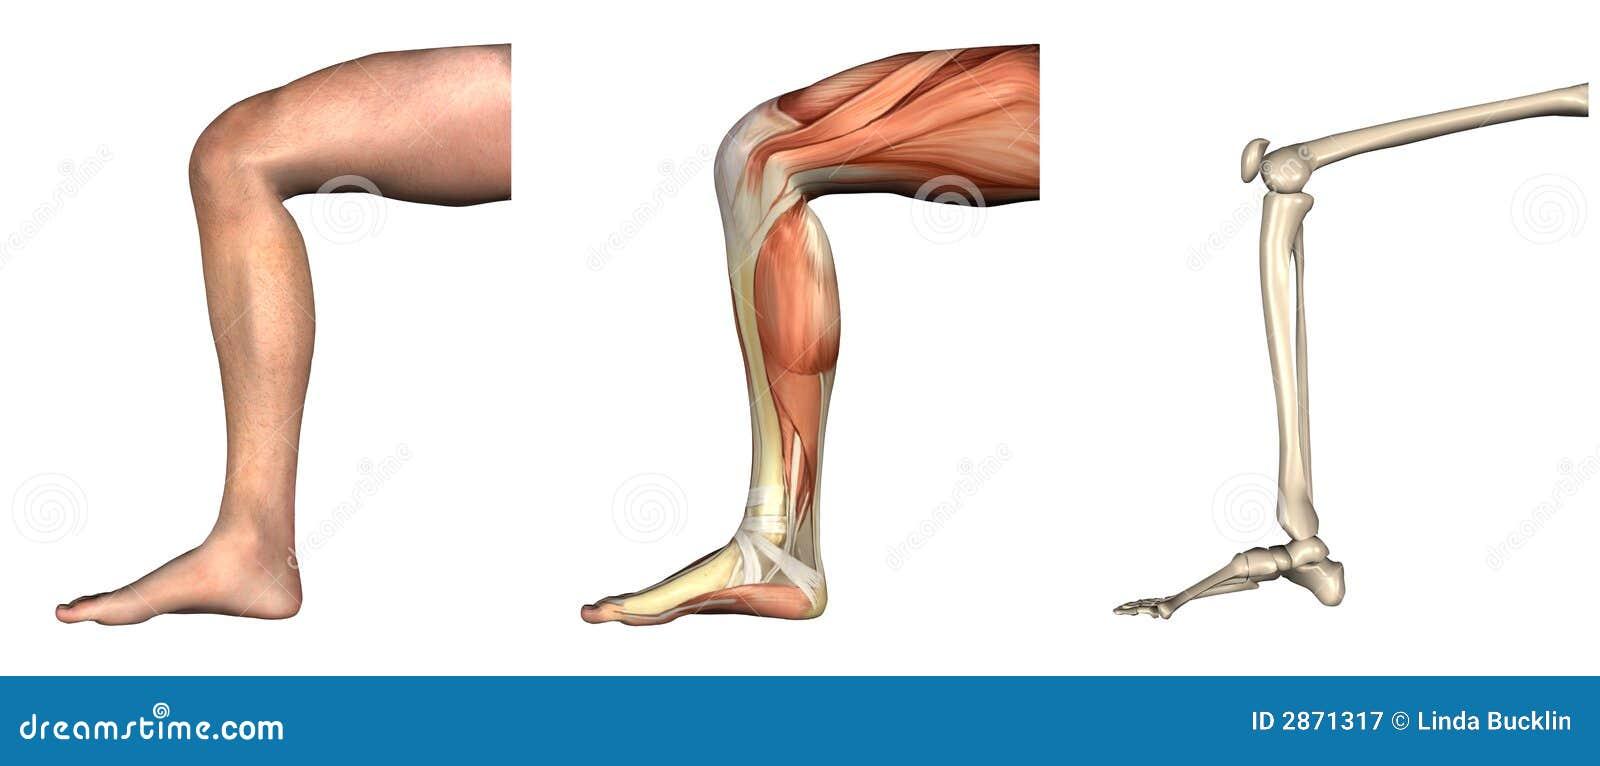 Anatomische Bekledingen - Gebogen Knie Stock Illustratie ...